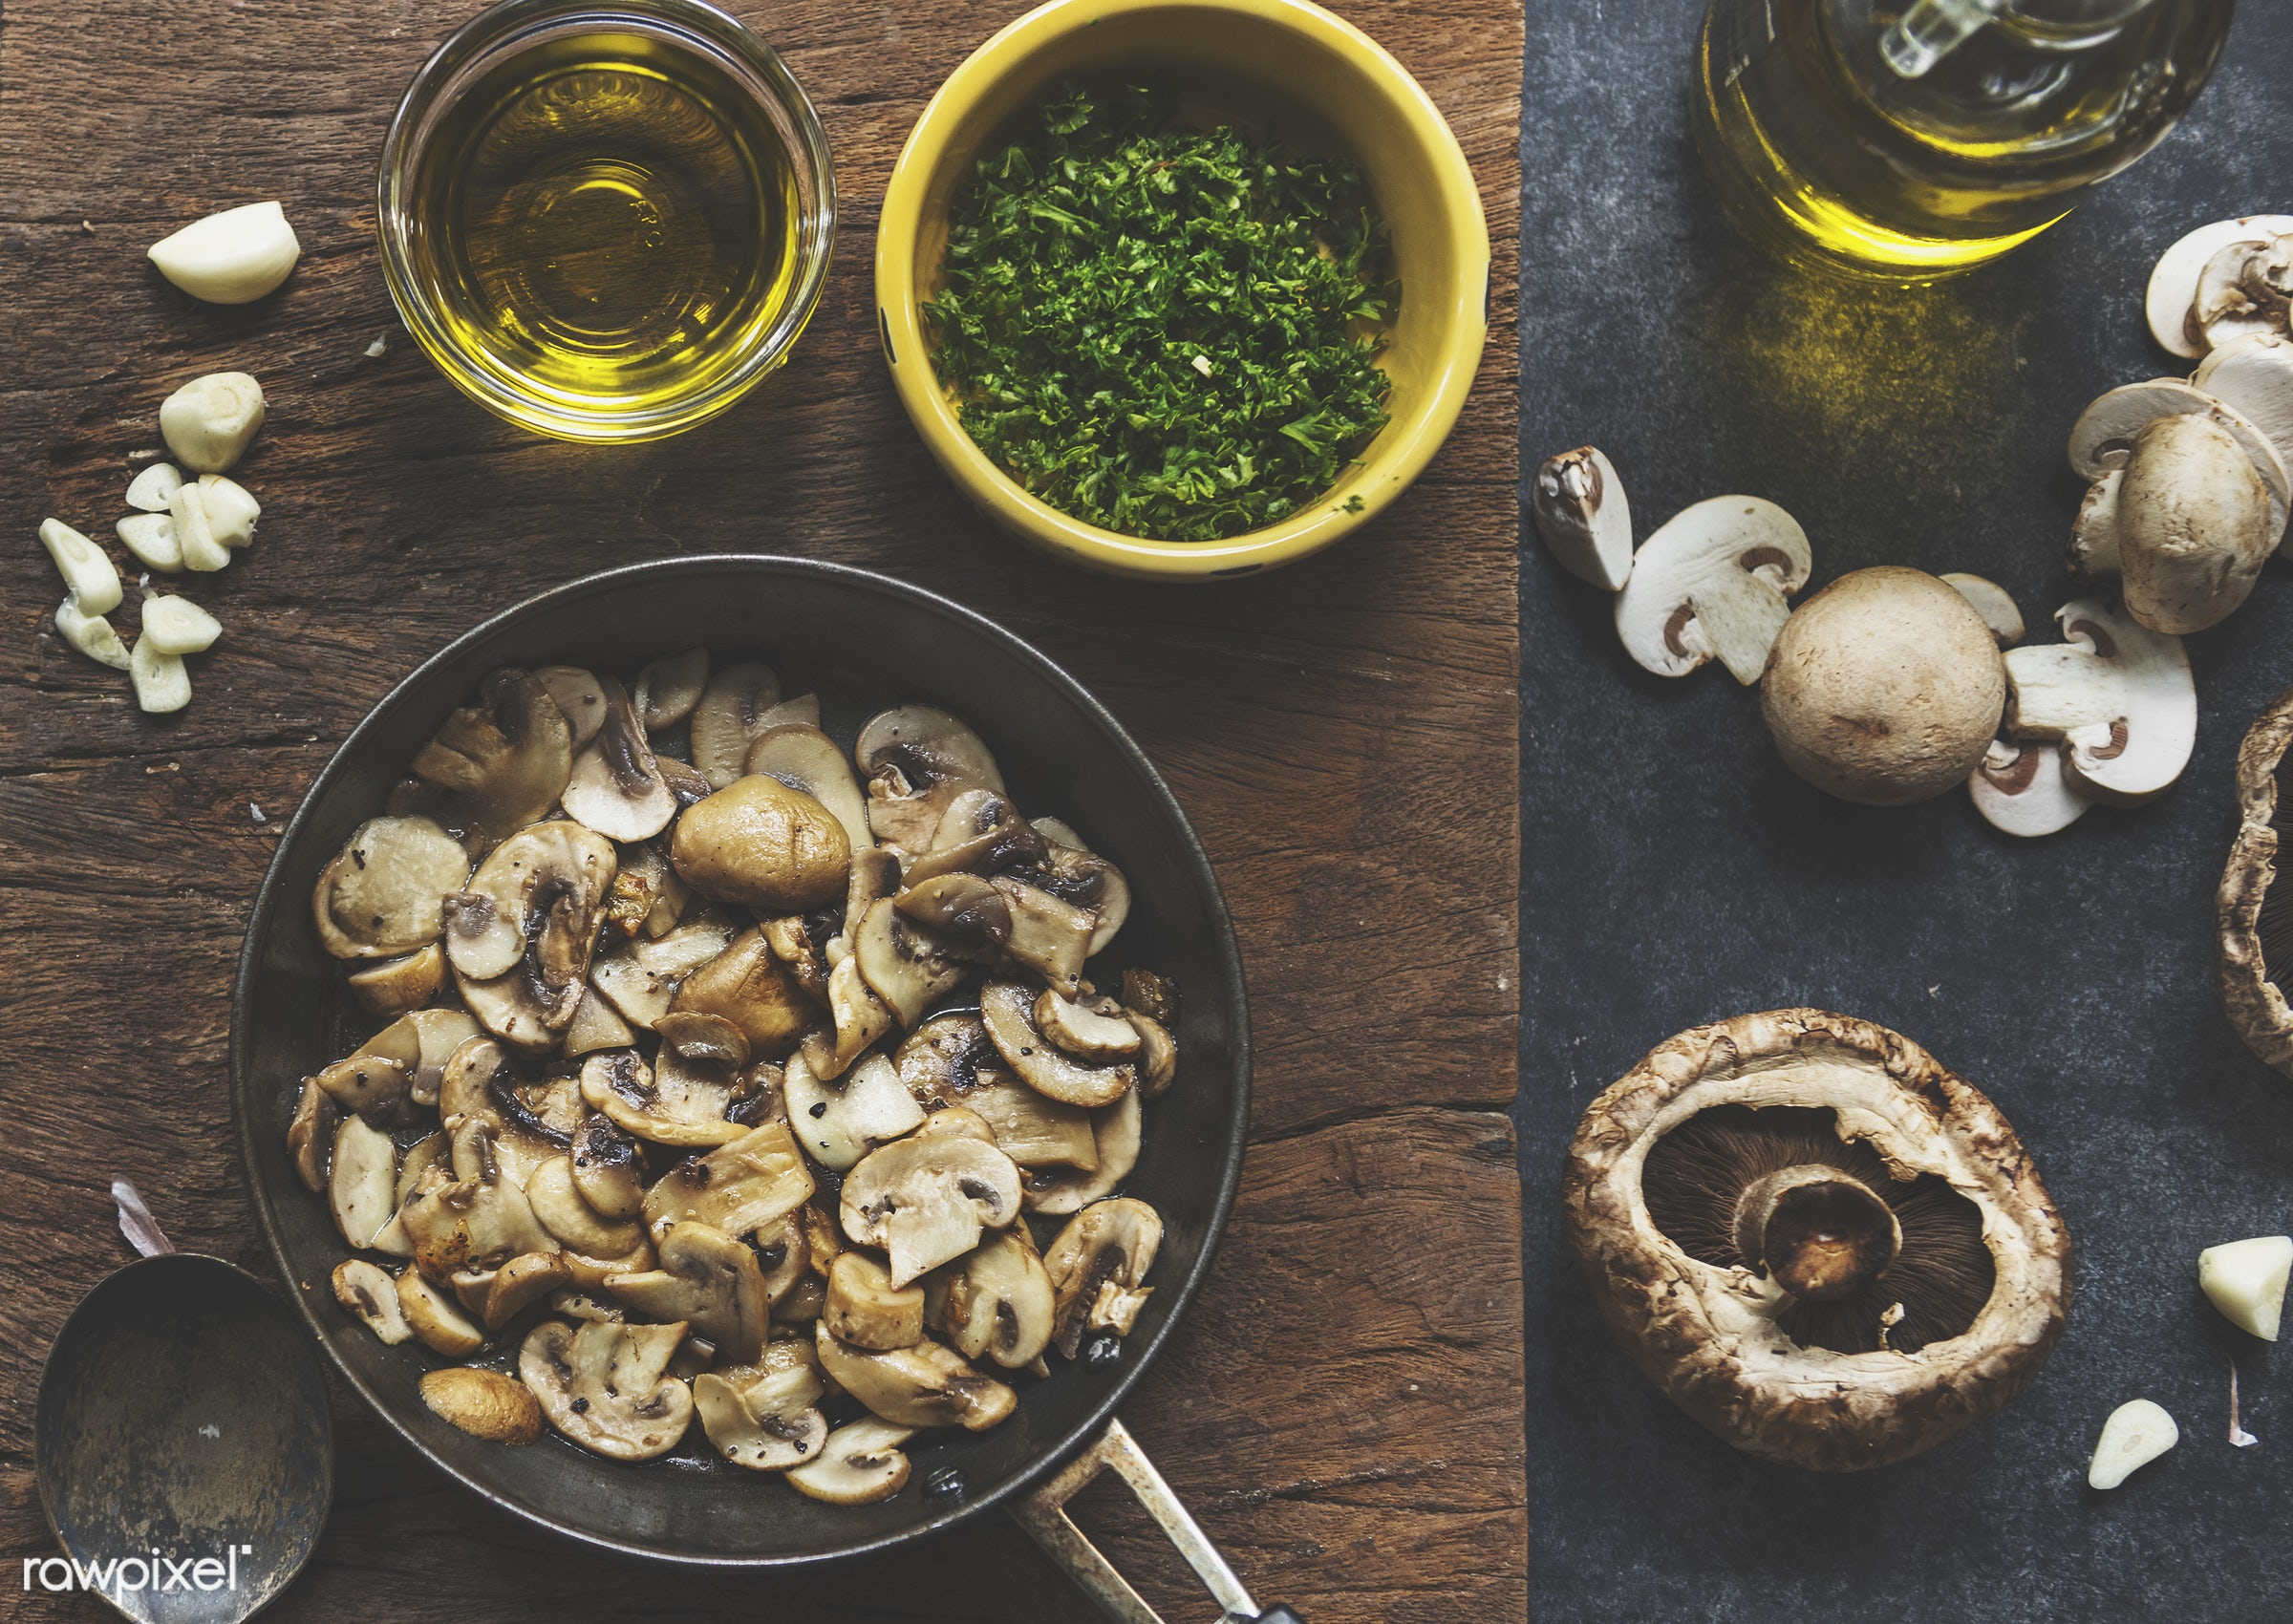 raw, mushroom, nutritious, sauteed, gastronomy, oil, fresh, vegetarian, cooking, ingredient, gourmet, nourishment, cutting...